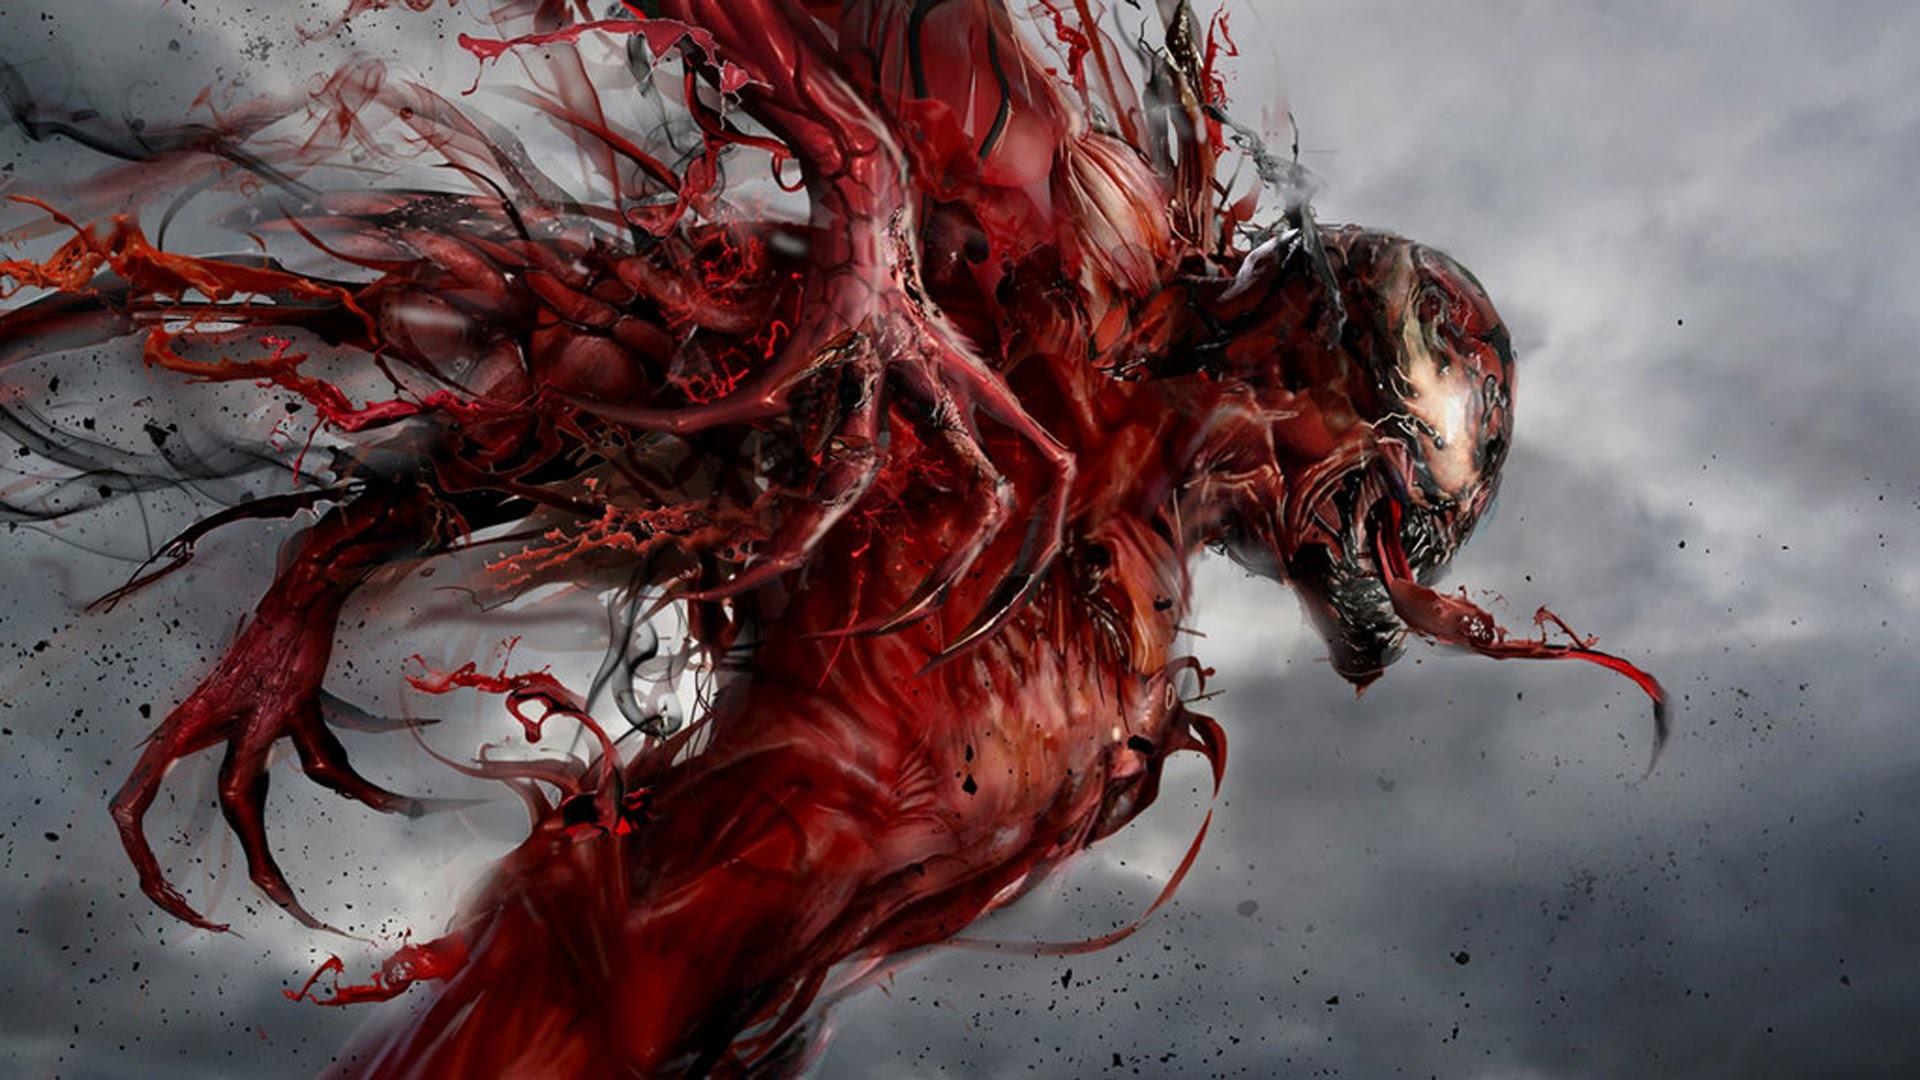 Venom vs Carnage Wallpaper – WallpaperSafari